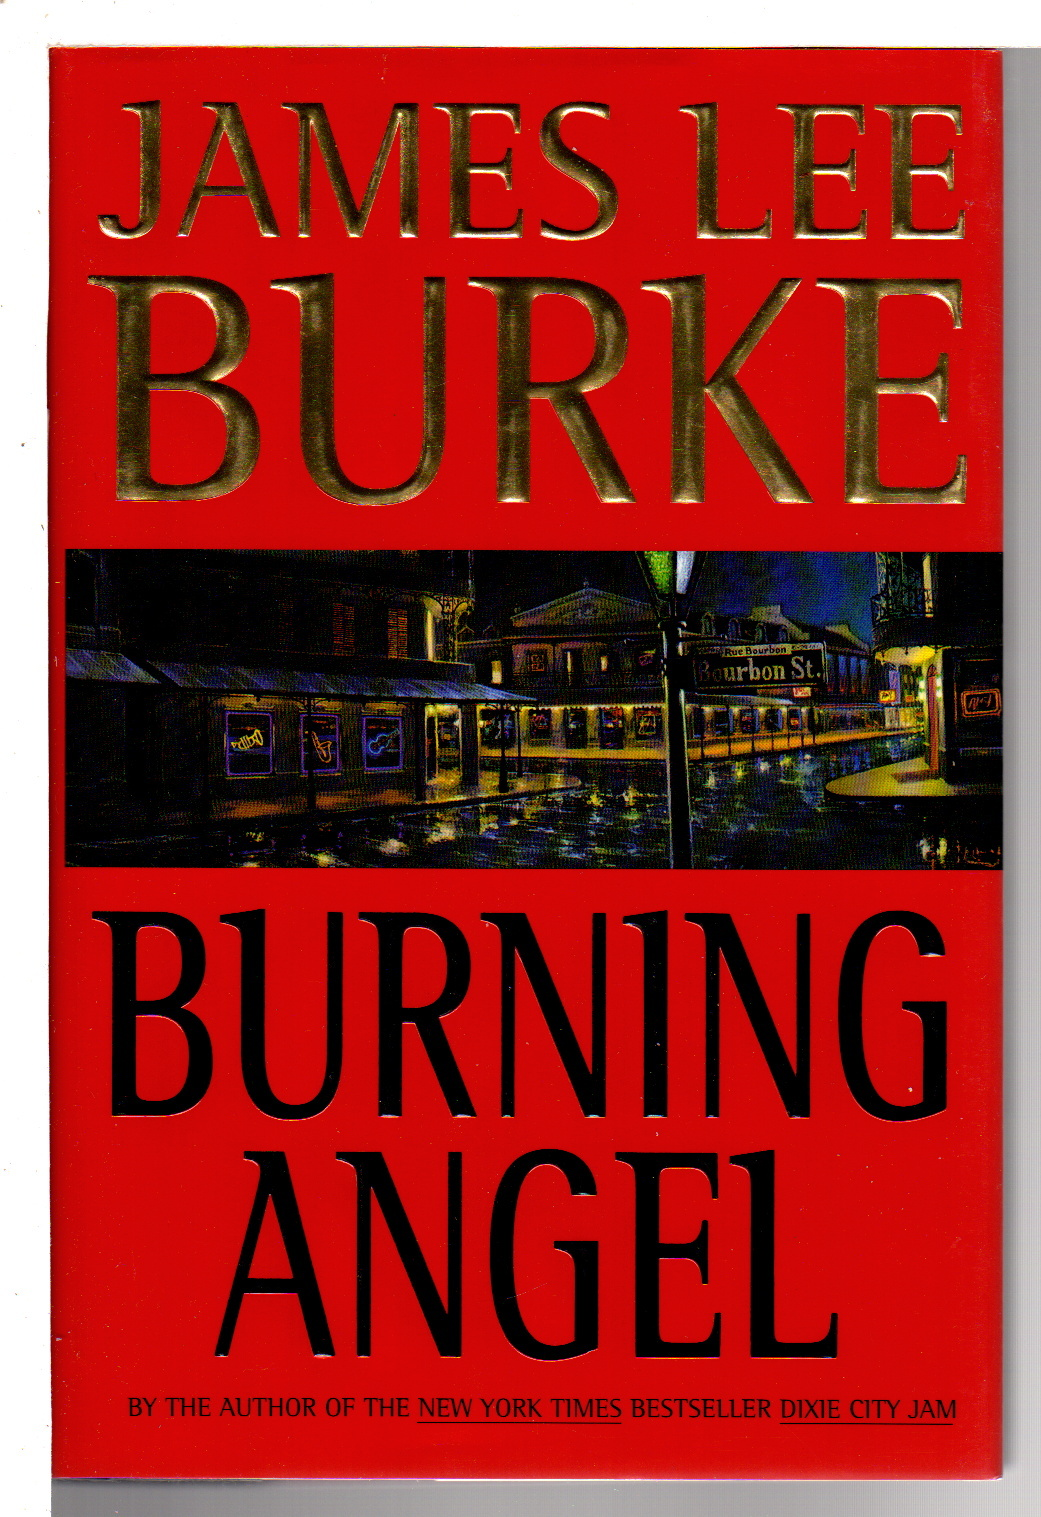 BURKE, JAMES LEE - BURNING ANGEL